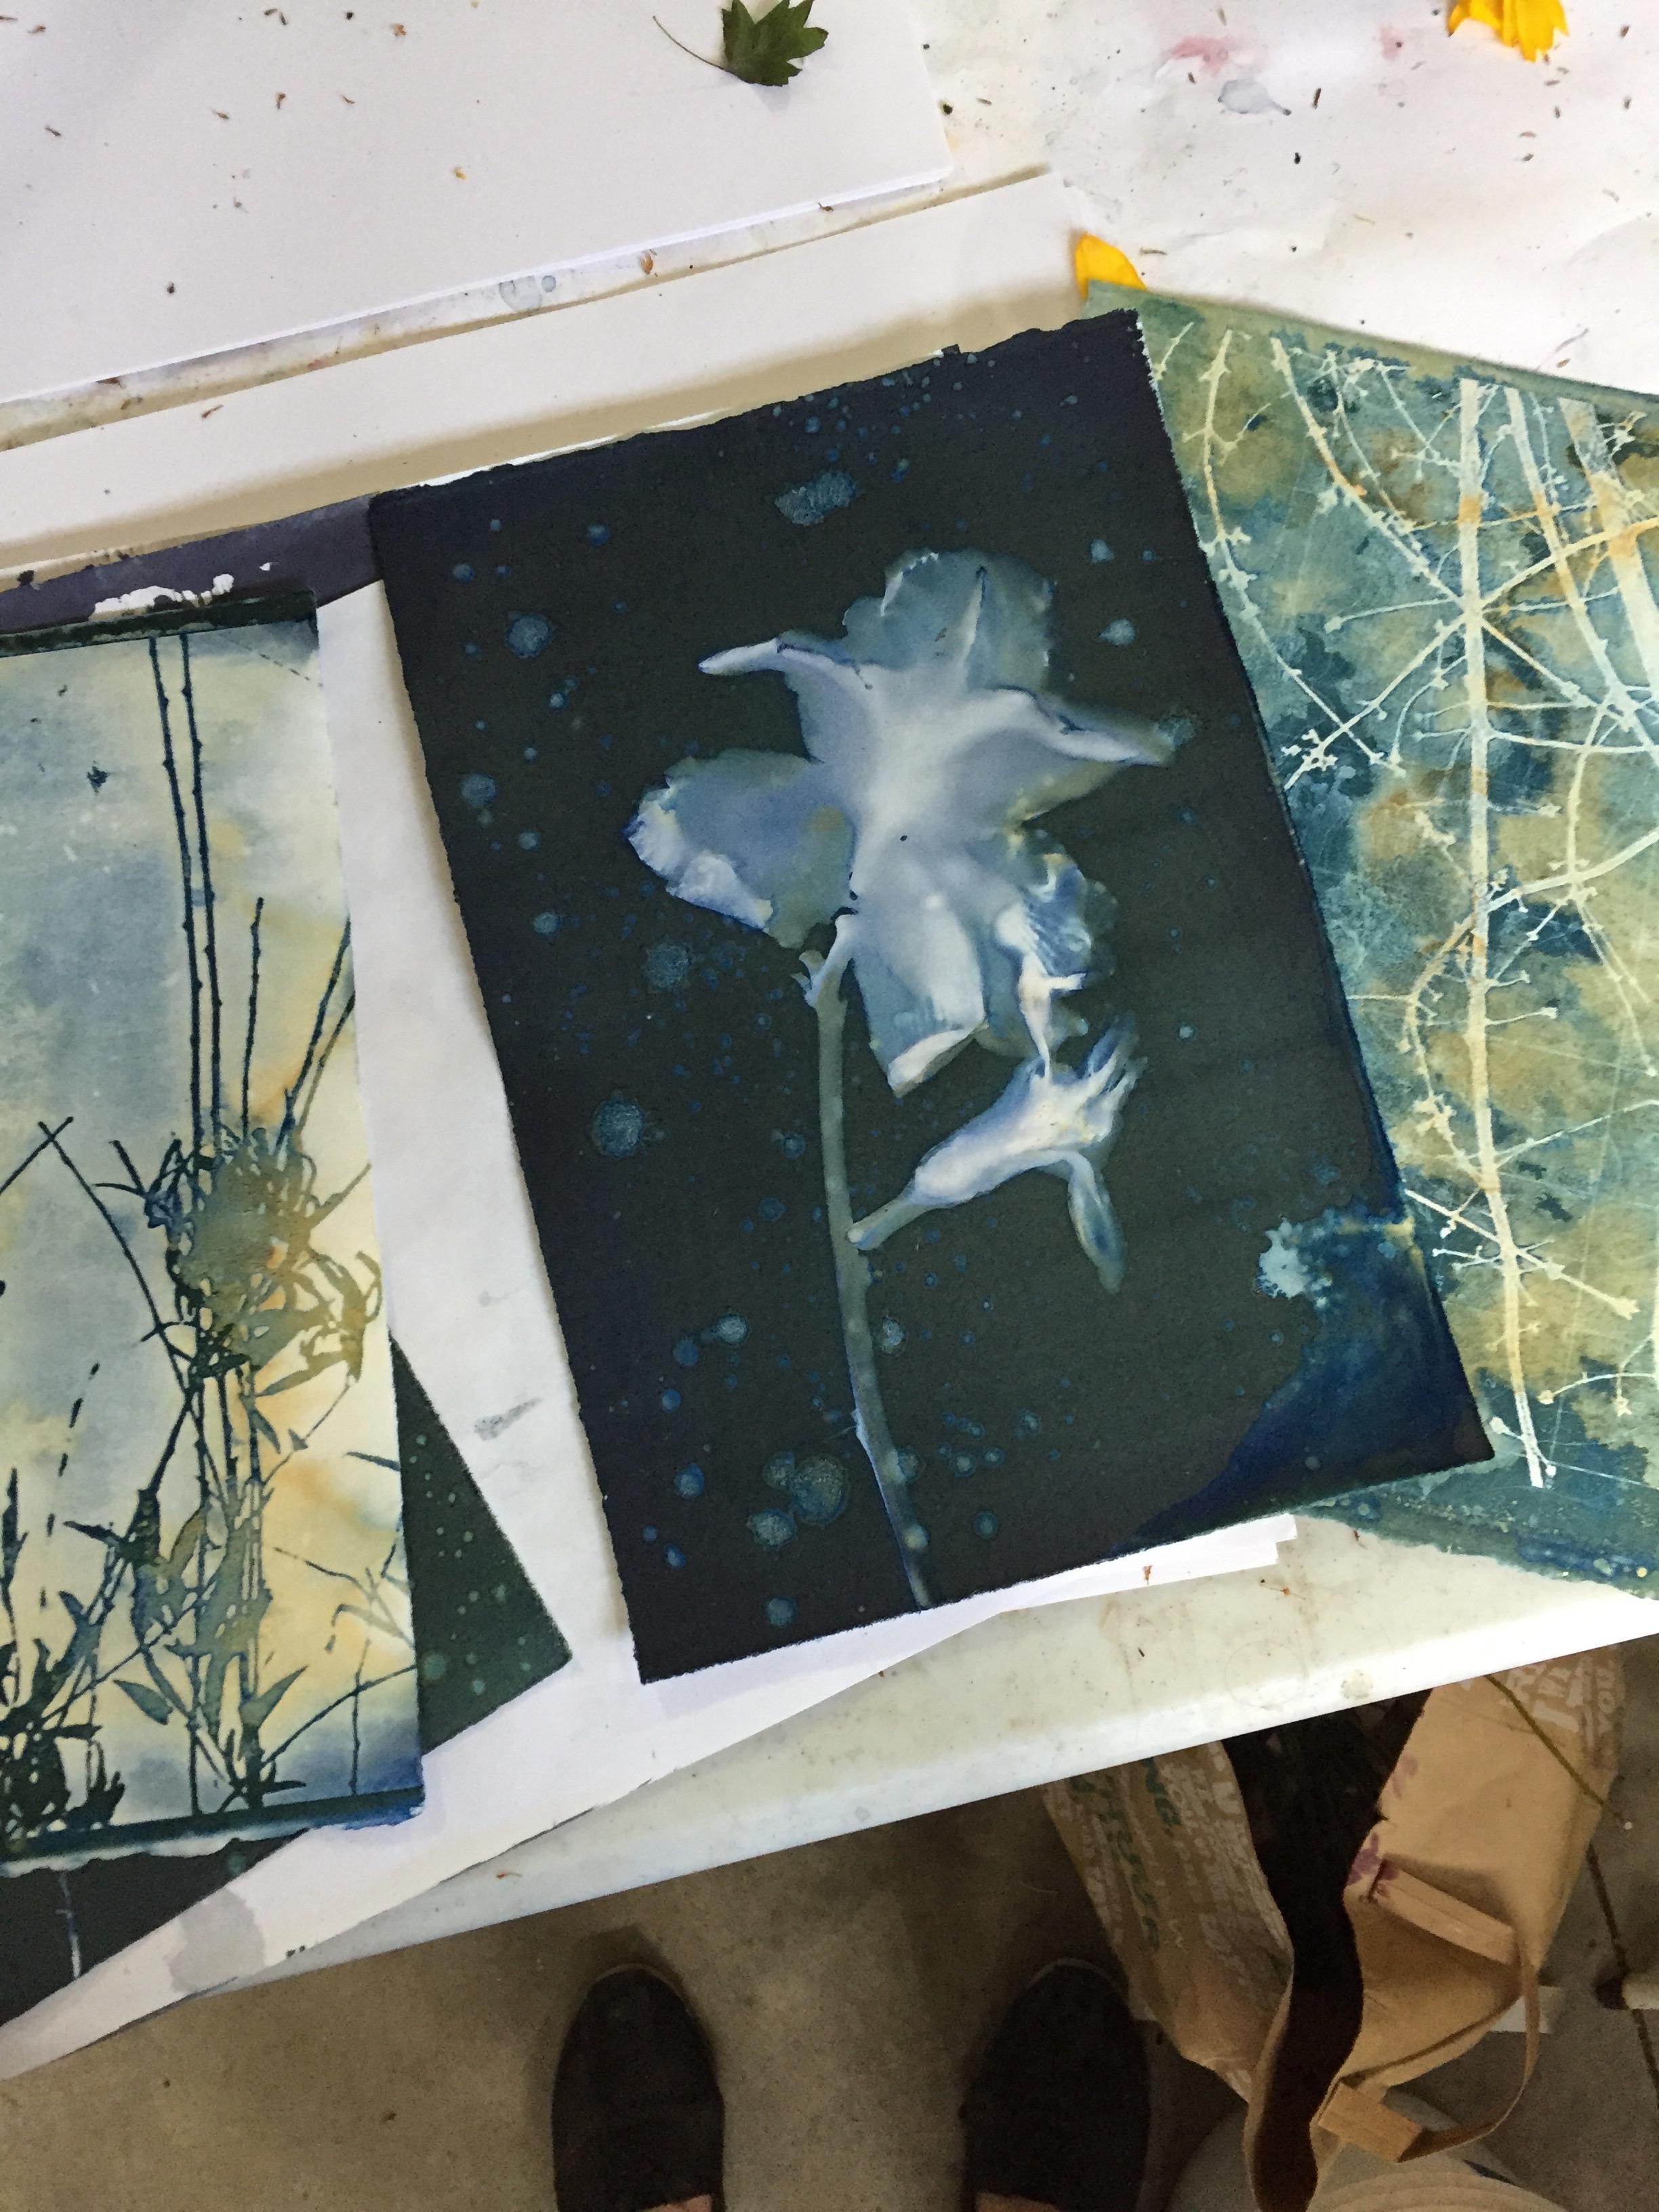 A few of the wet cyanotypes created last weekend